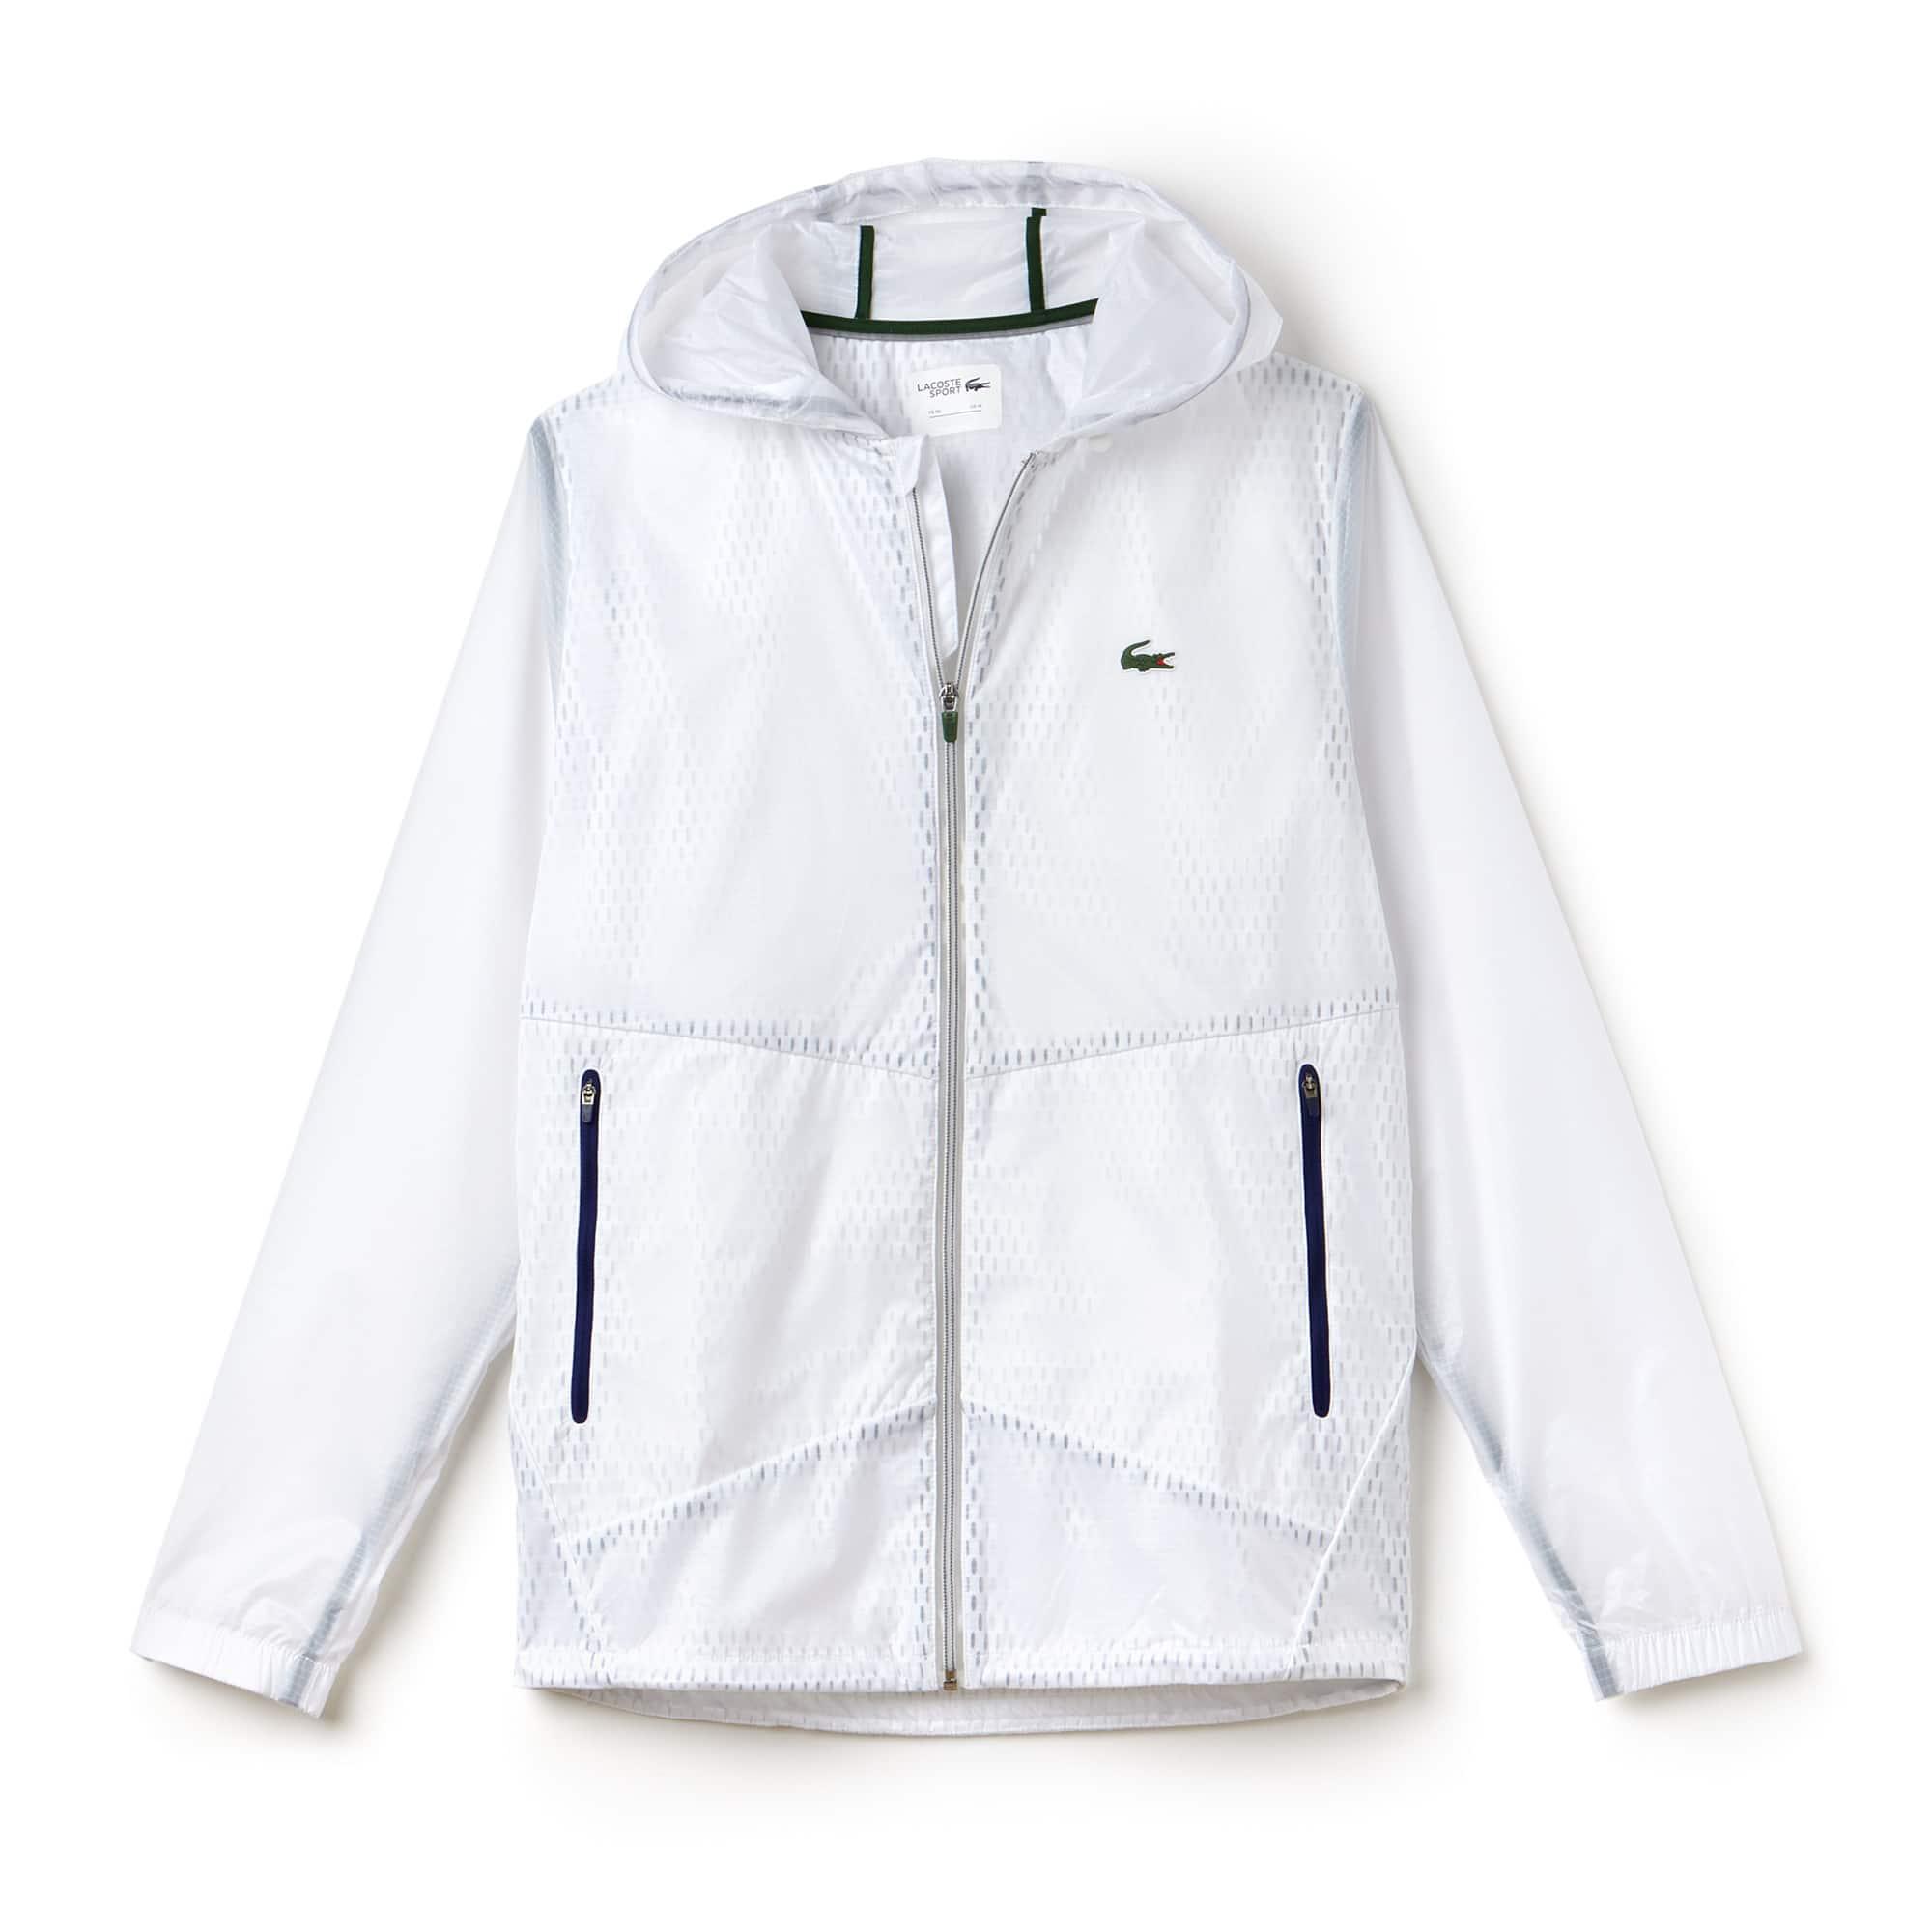 Lacoste 3xl jacket